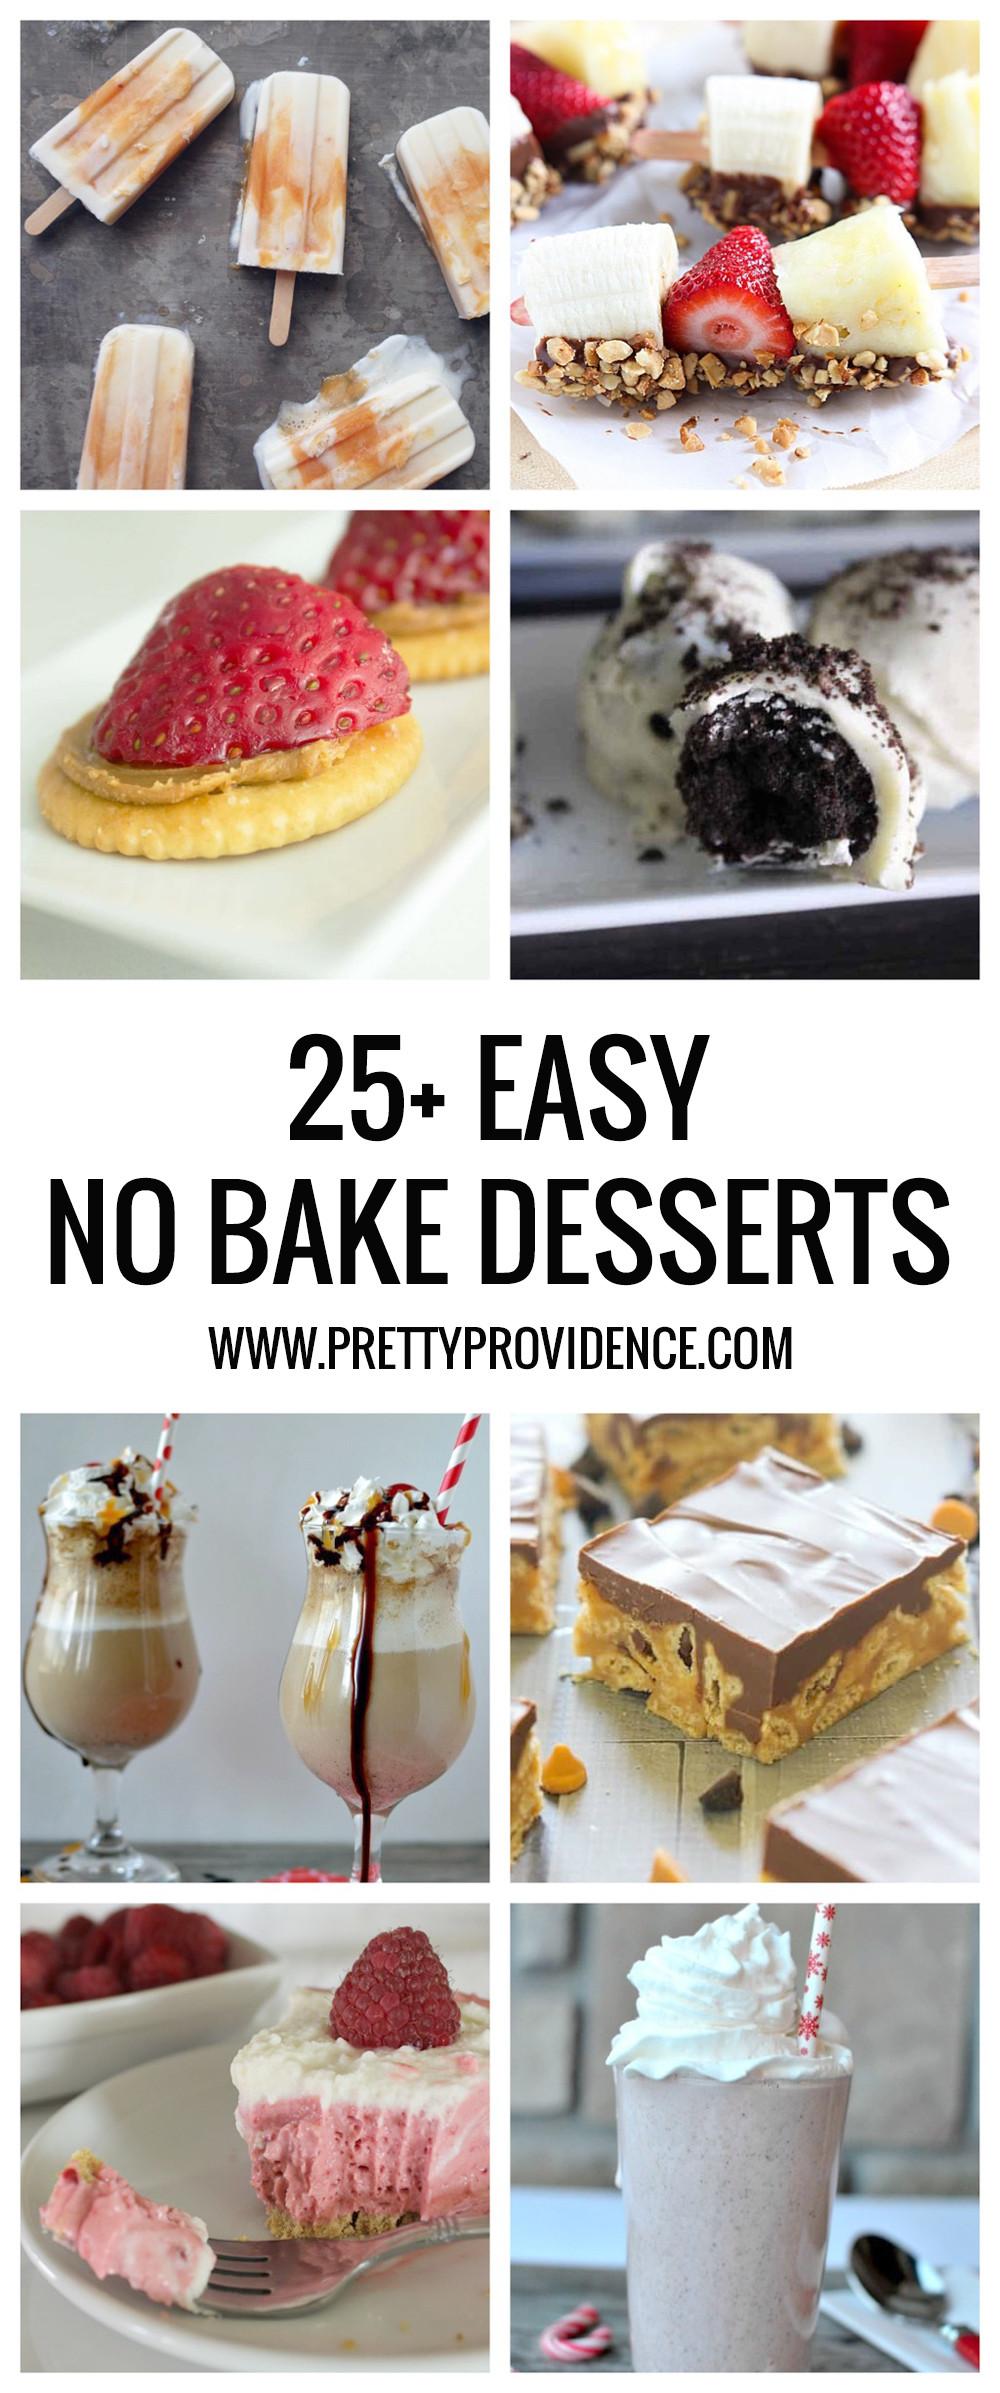 Best No Bake Dessert  25 The Best No Bake Desserts Pretty Providence